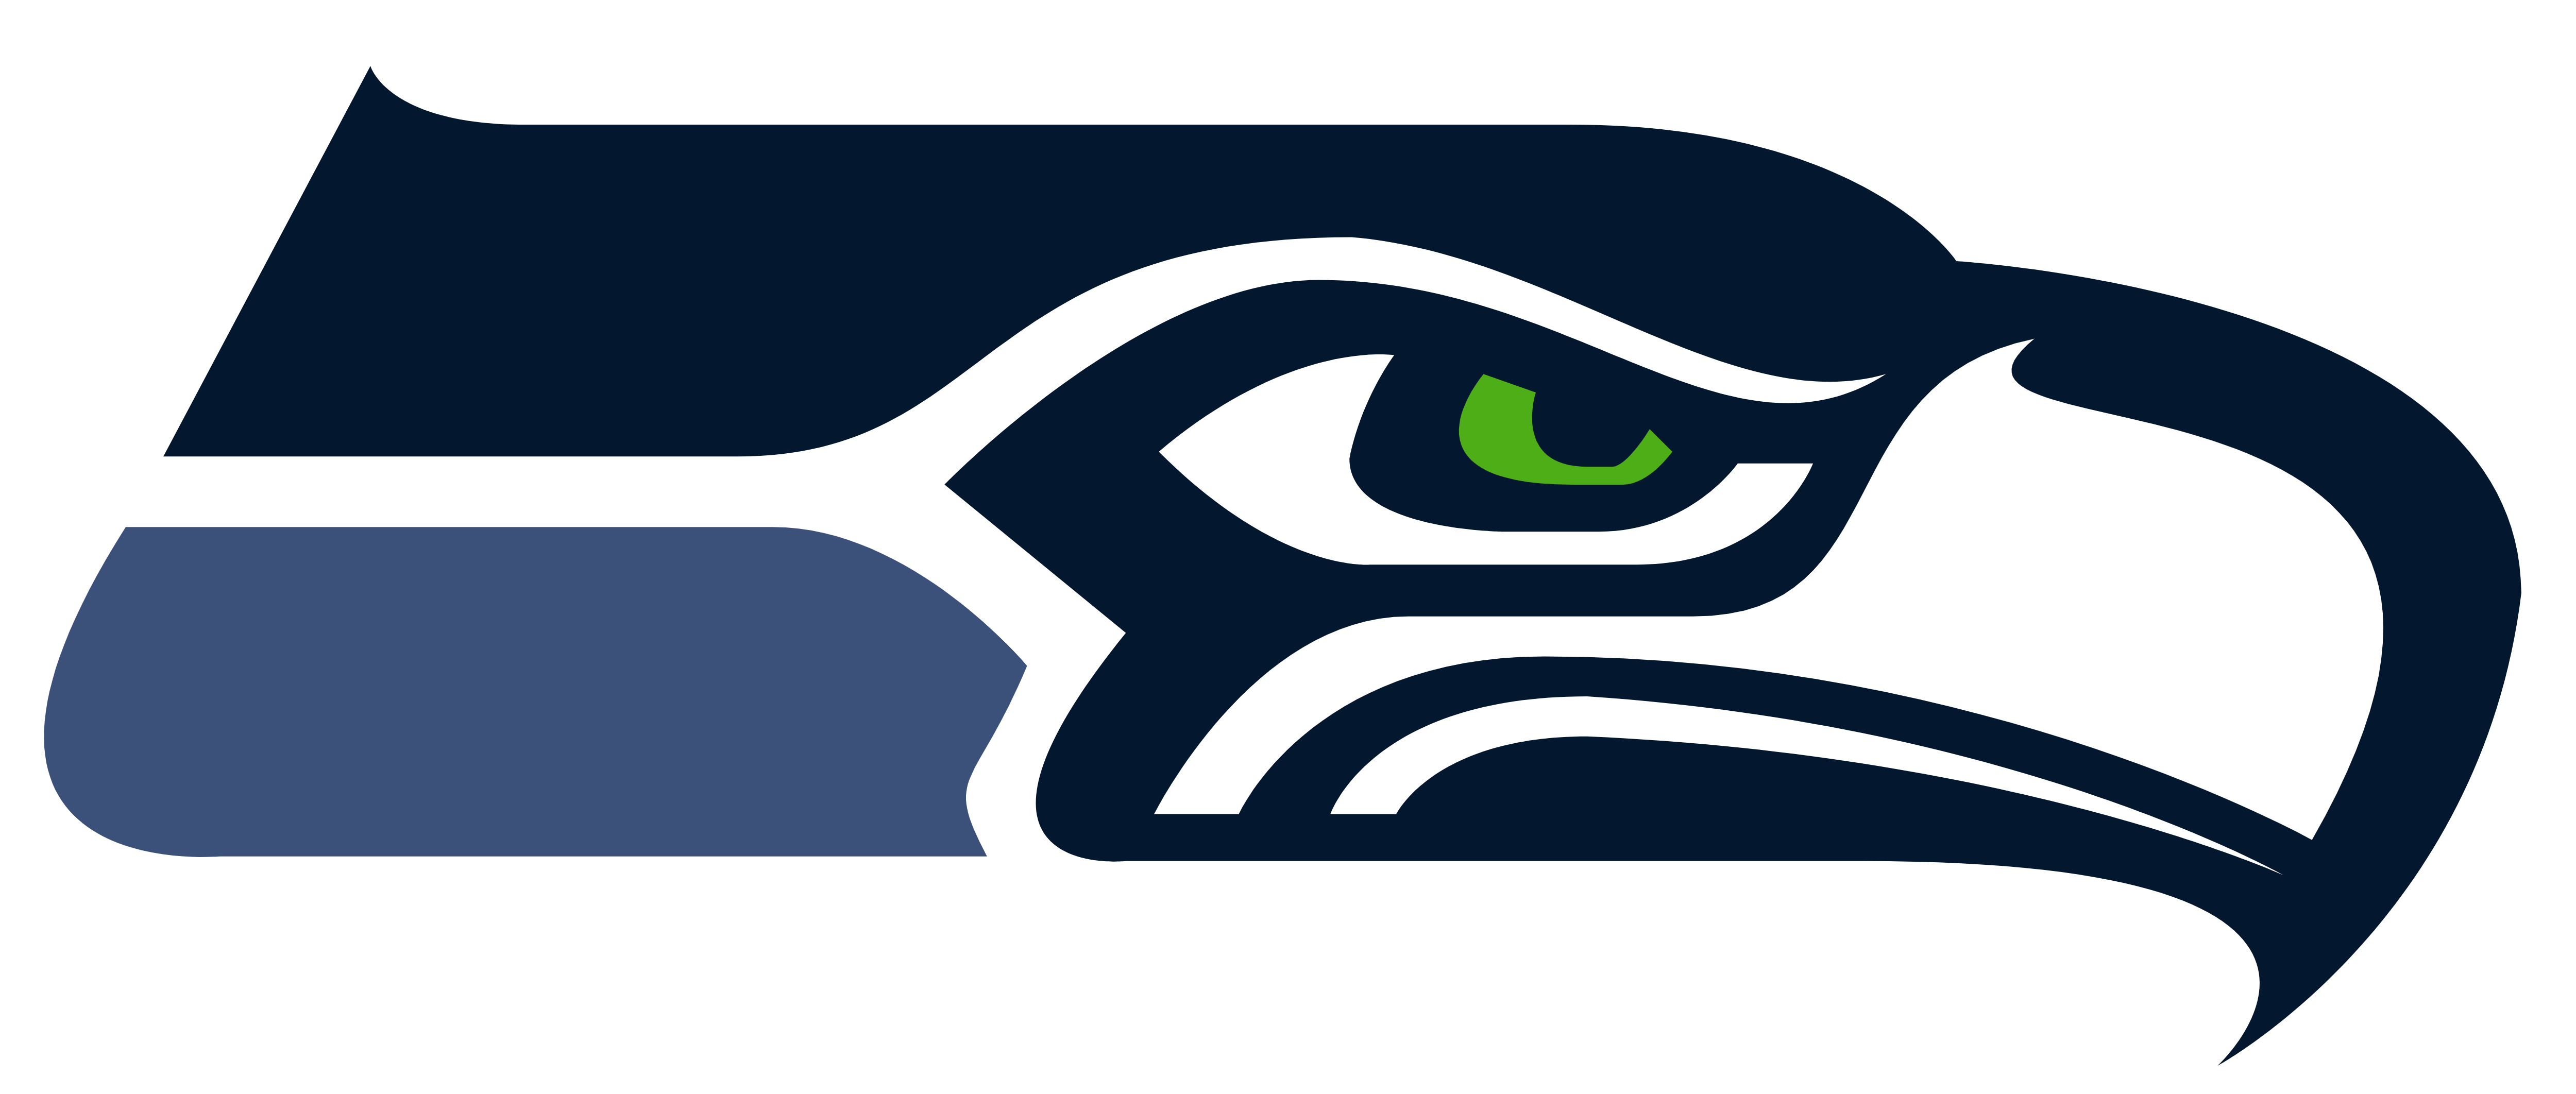 Seattle Seahawks - Logos Download